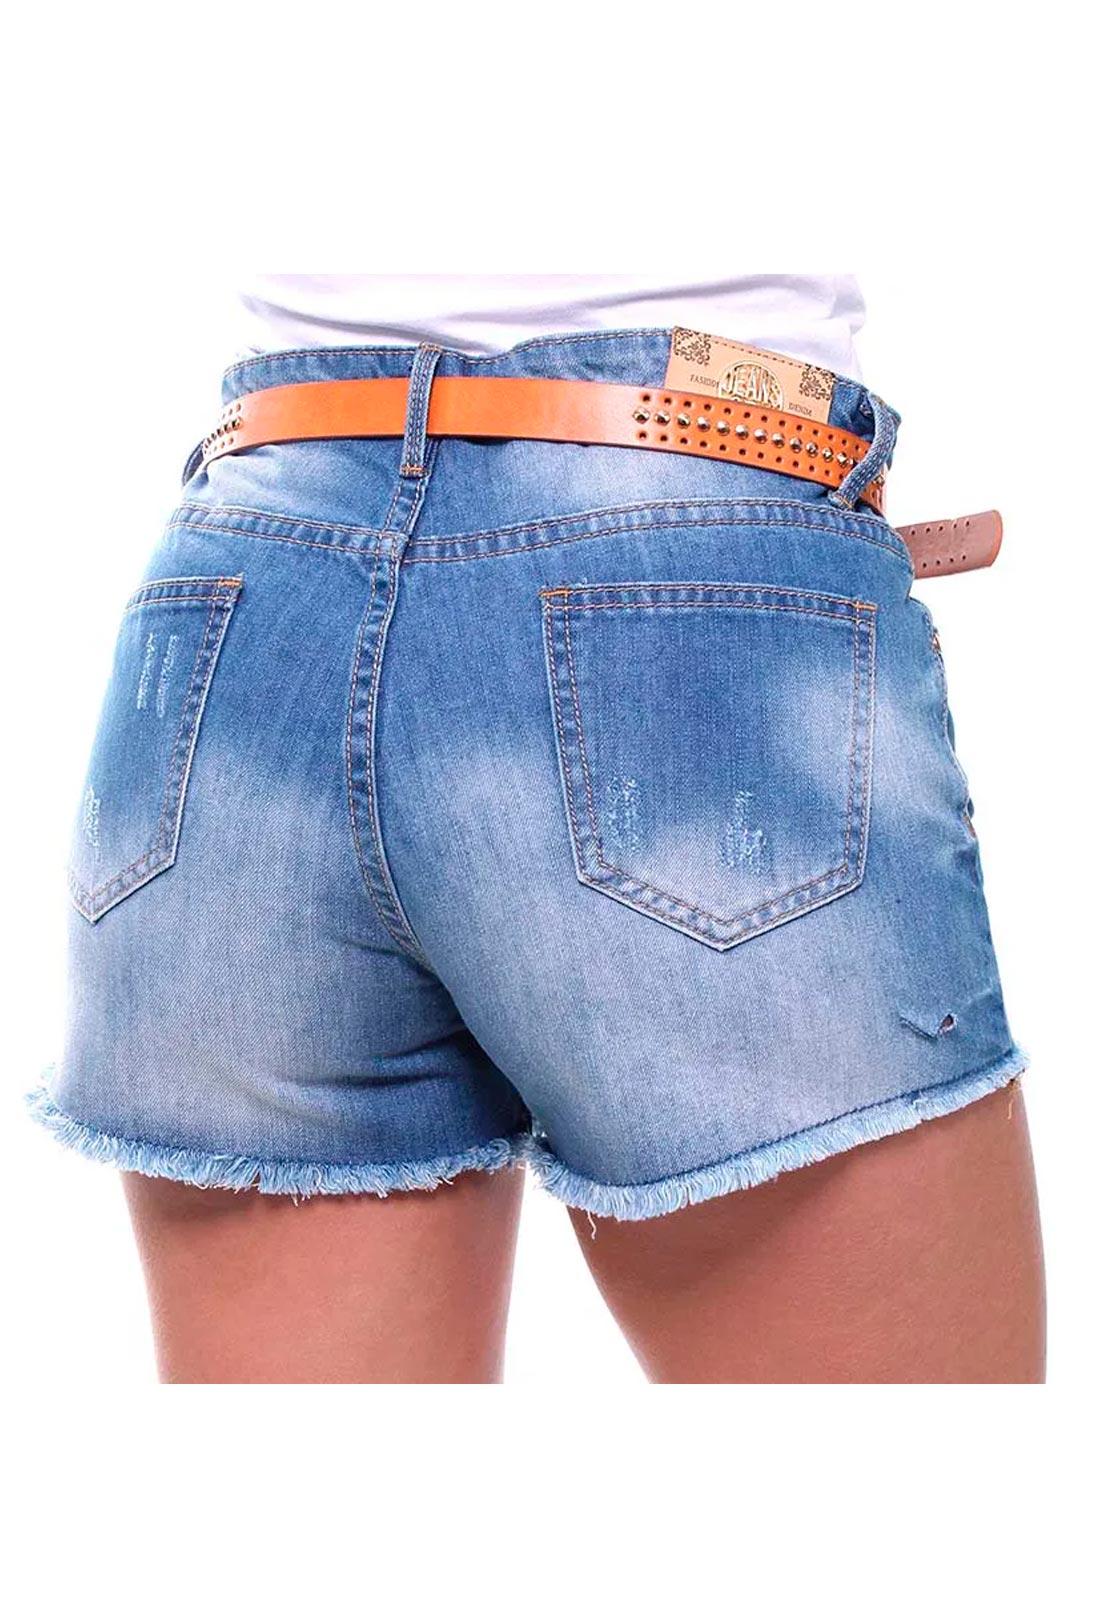 Short Jeans Feminino Curto Barra Desfiada Com Cinto Boy Crocker - 46452  - CROCKER JEANS